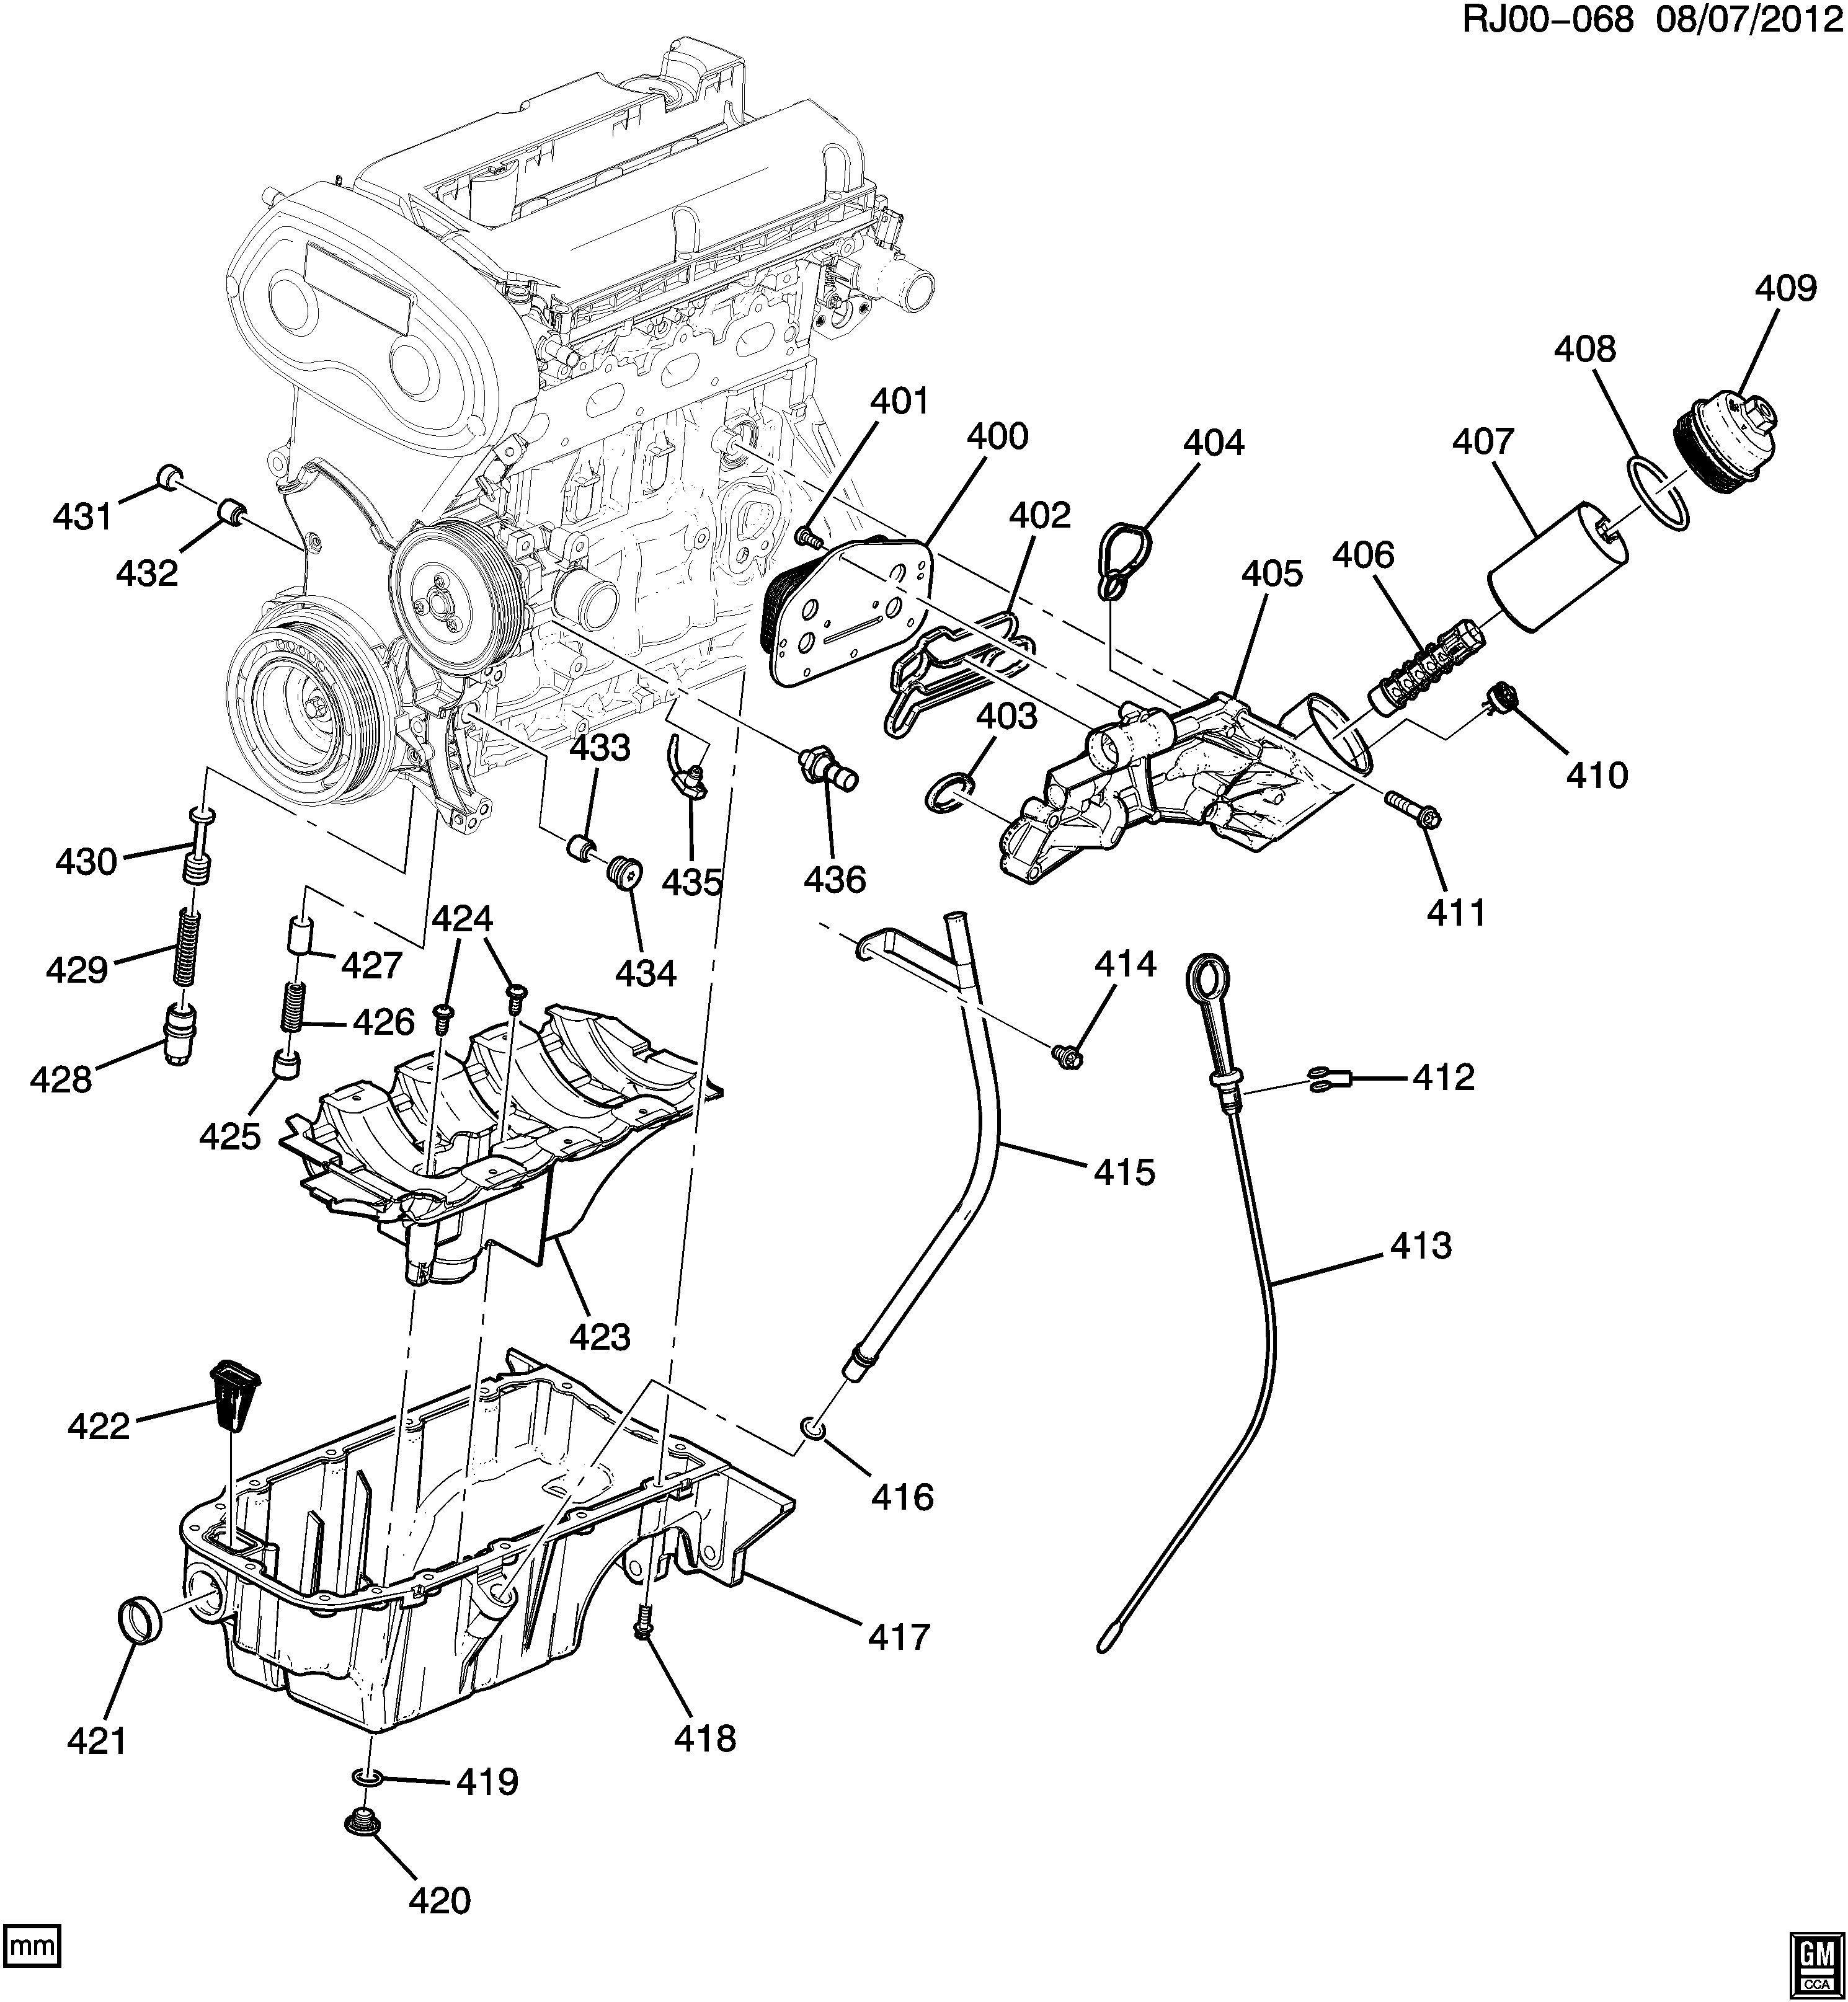 Chevrolet Cruze LTZ ECO Bolt, Engine Oil CLEAR